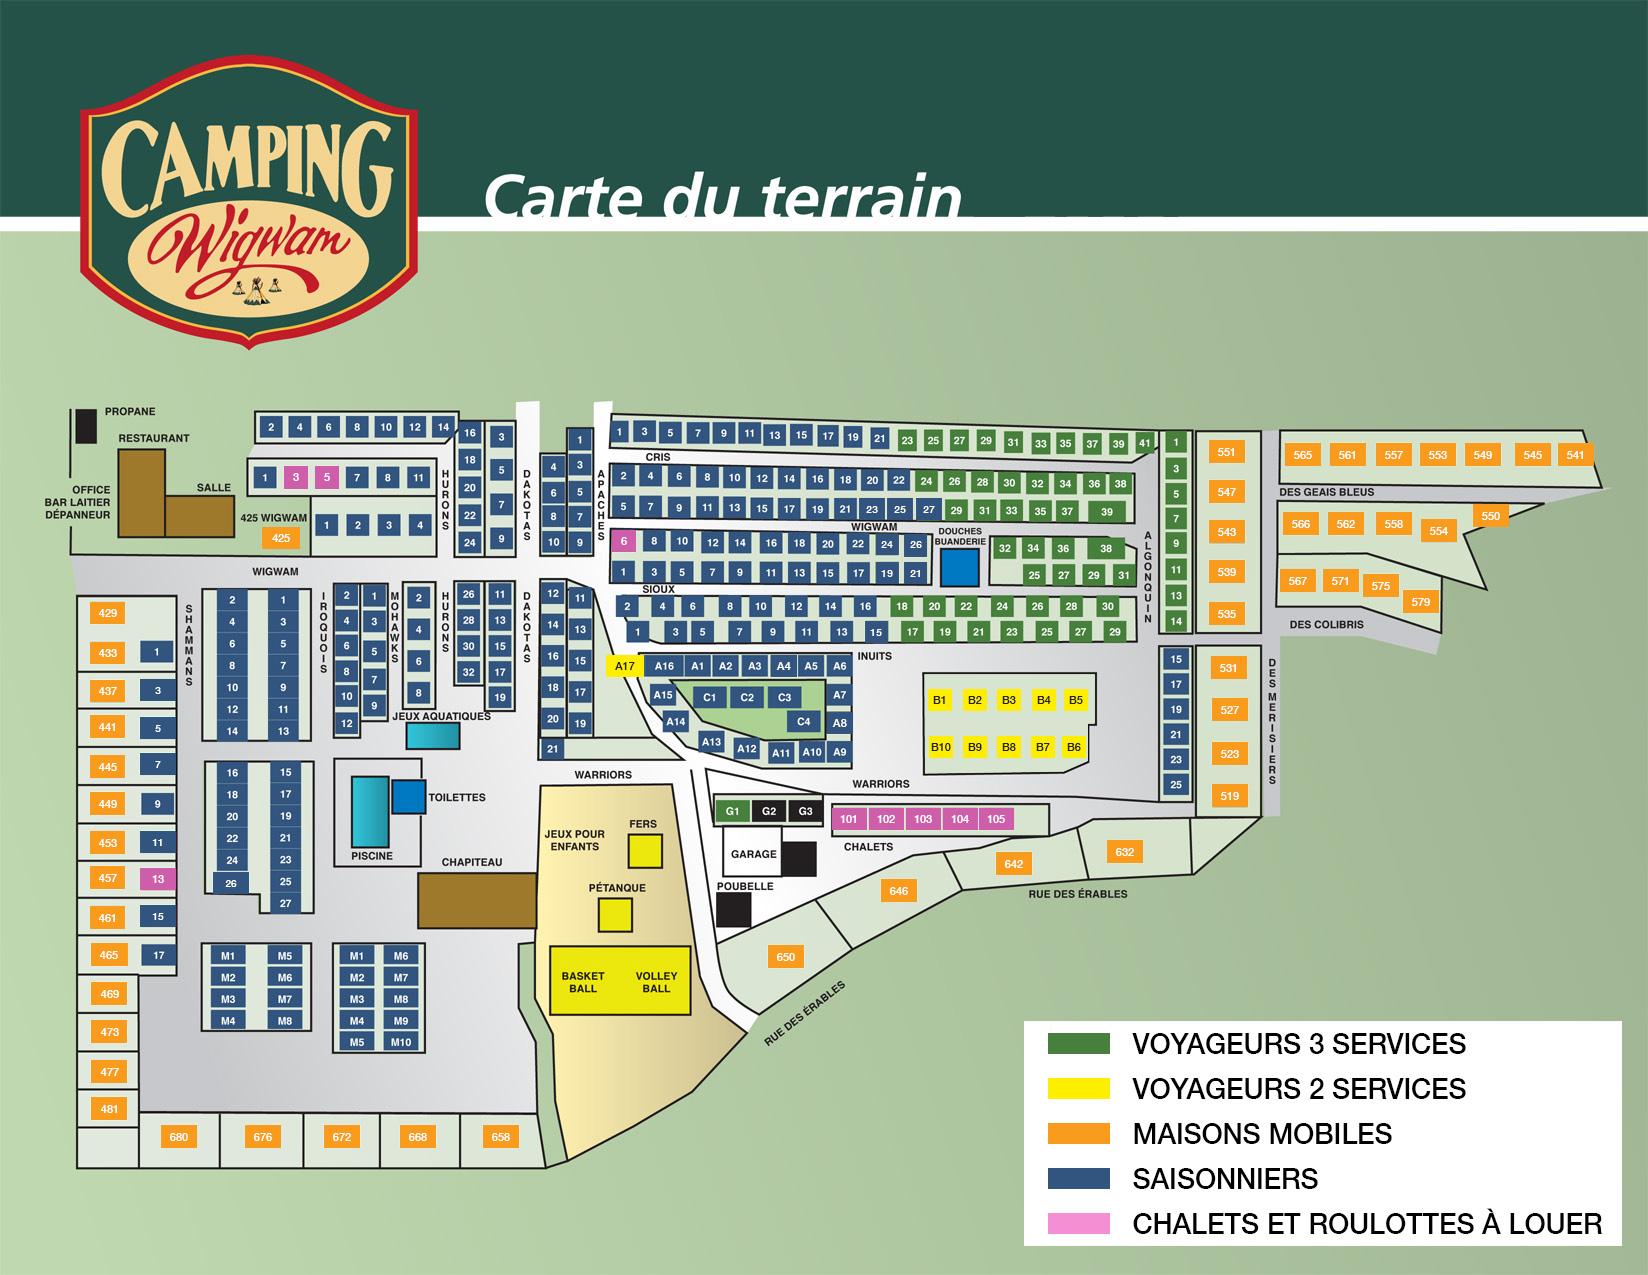 Carte du terrain du Camping Wigwam